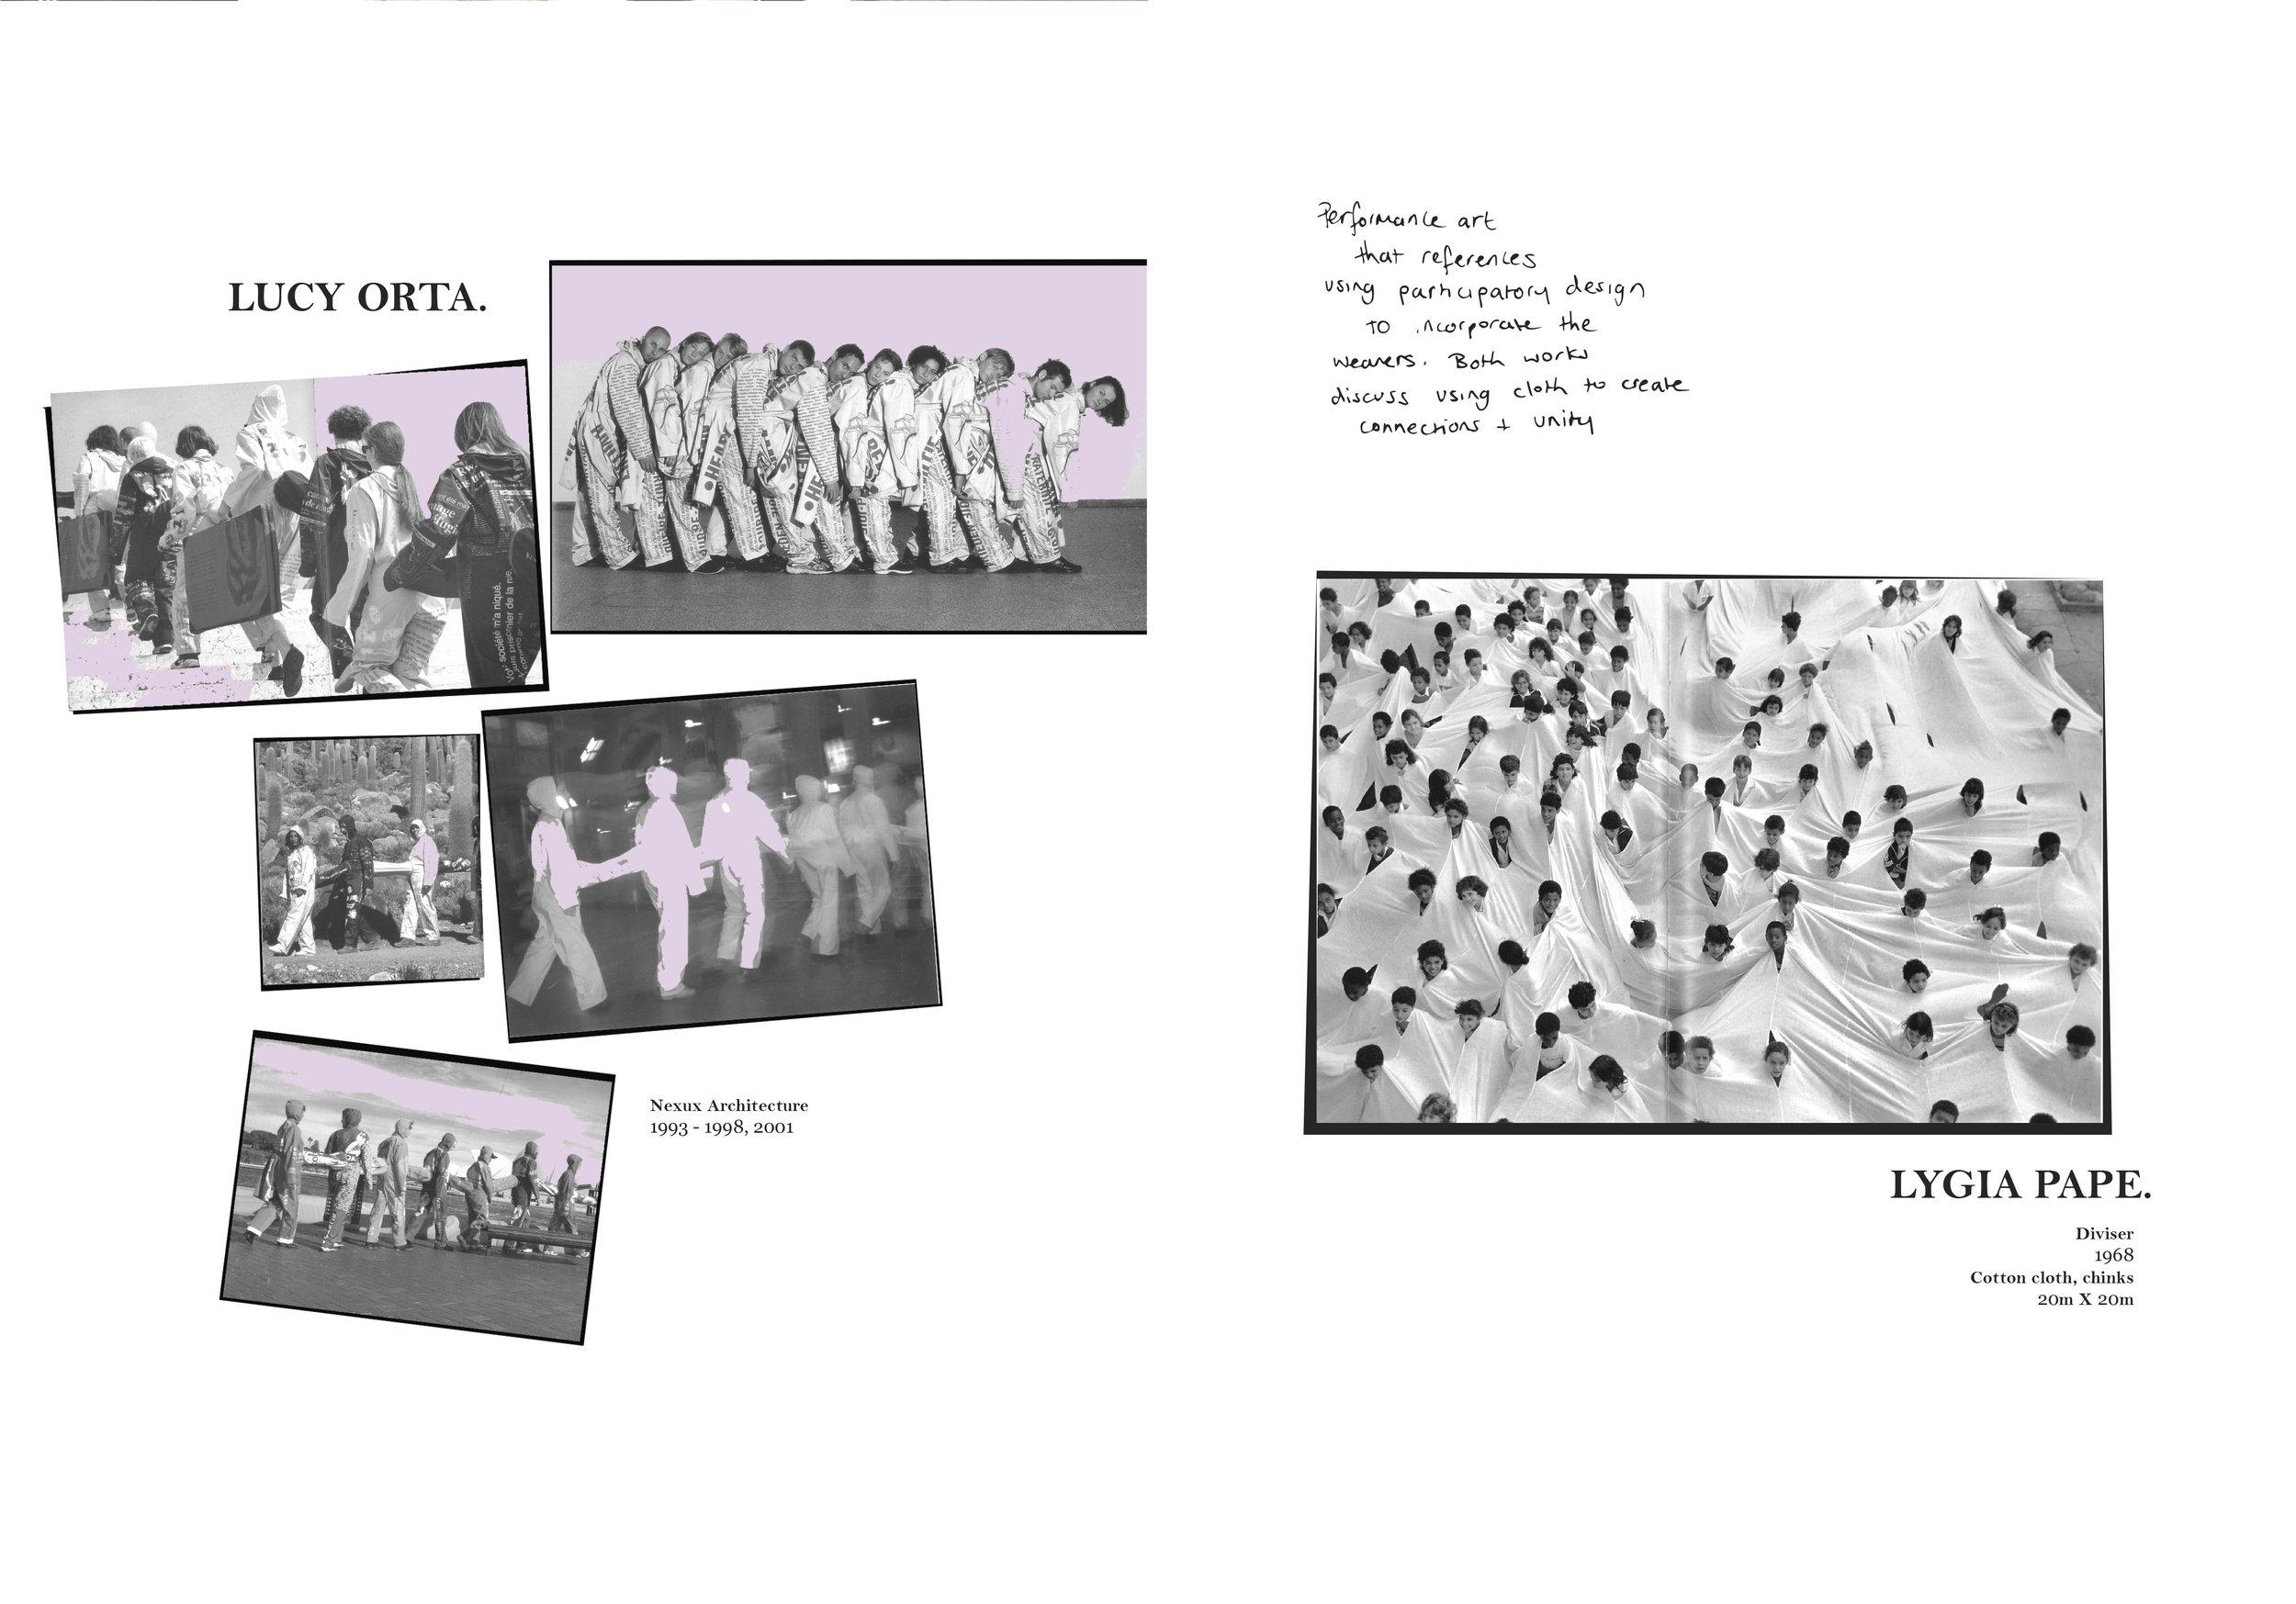 fol10.jpg